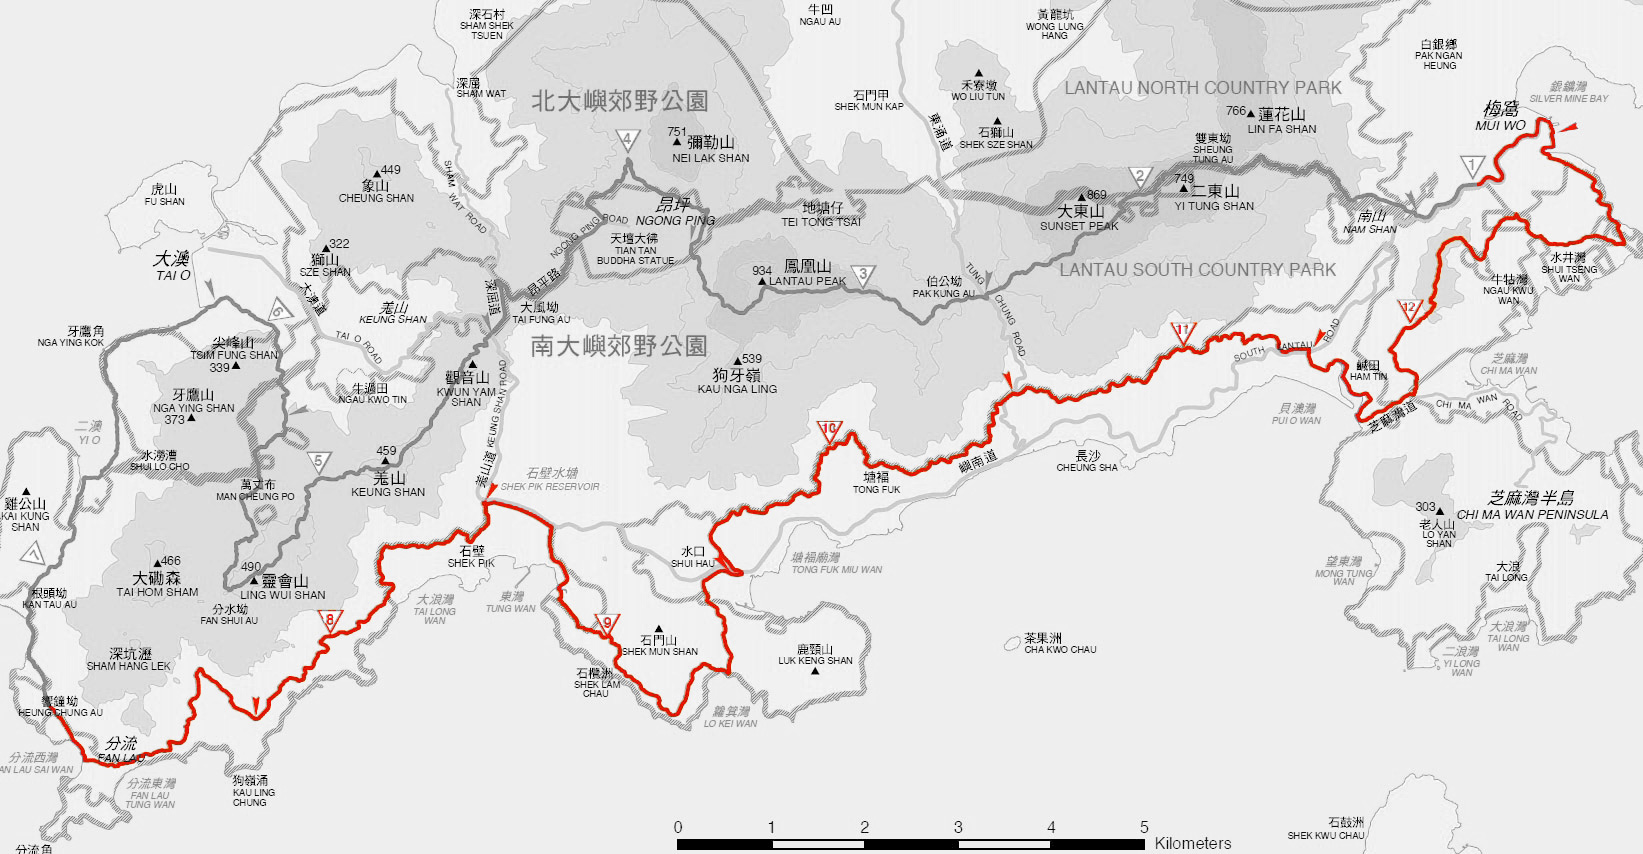 lt-map-2